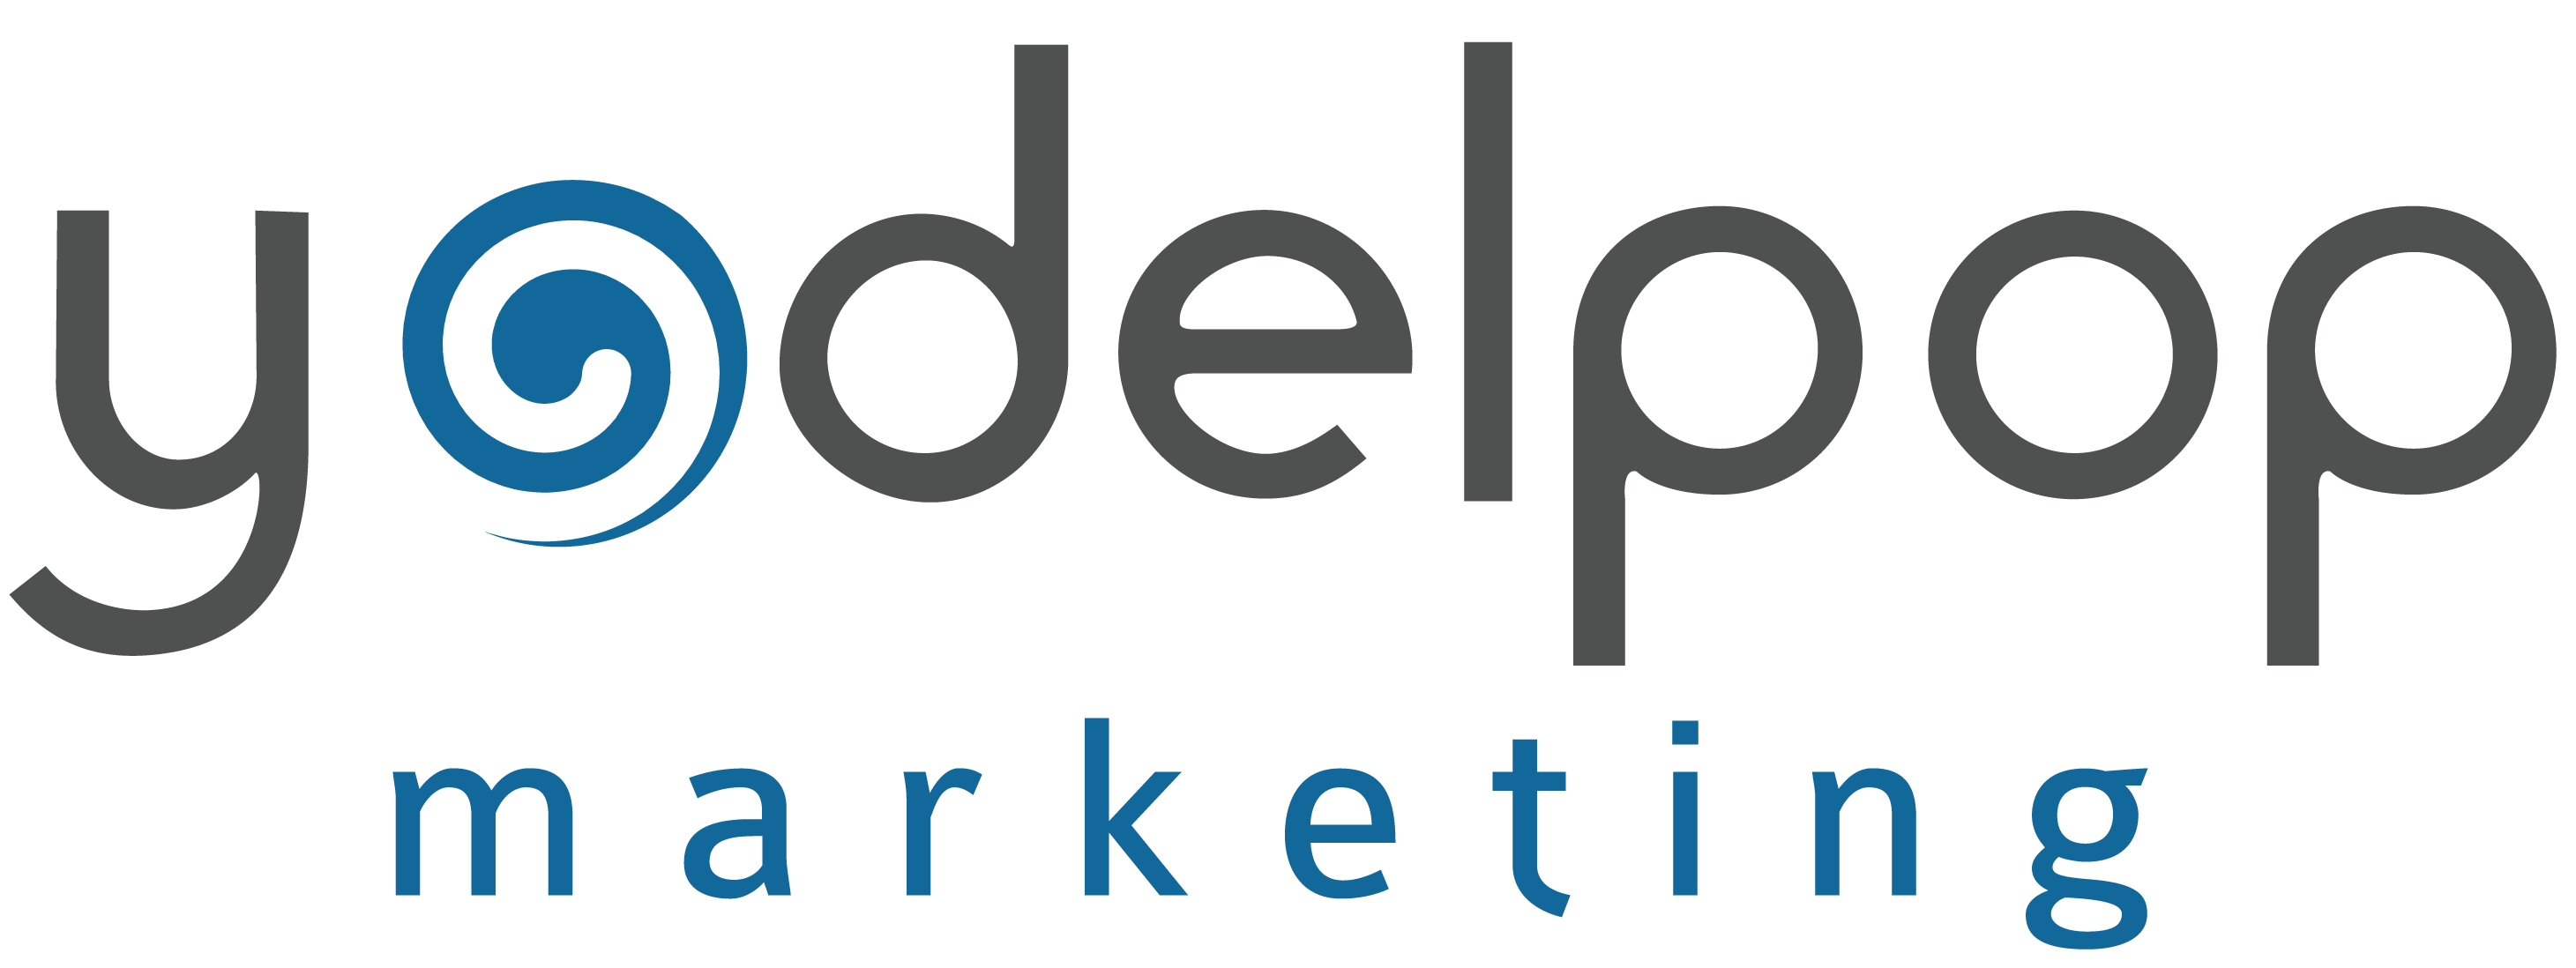 logo-fall-2016-lg.png